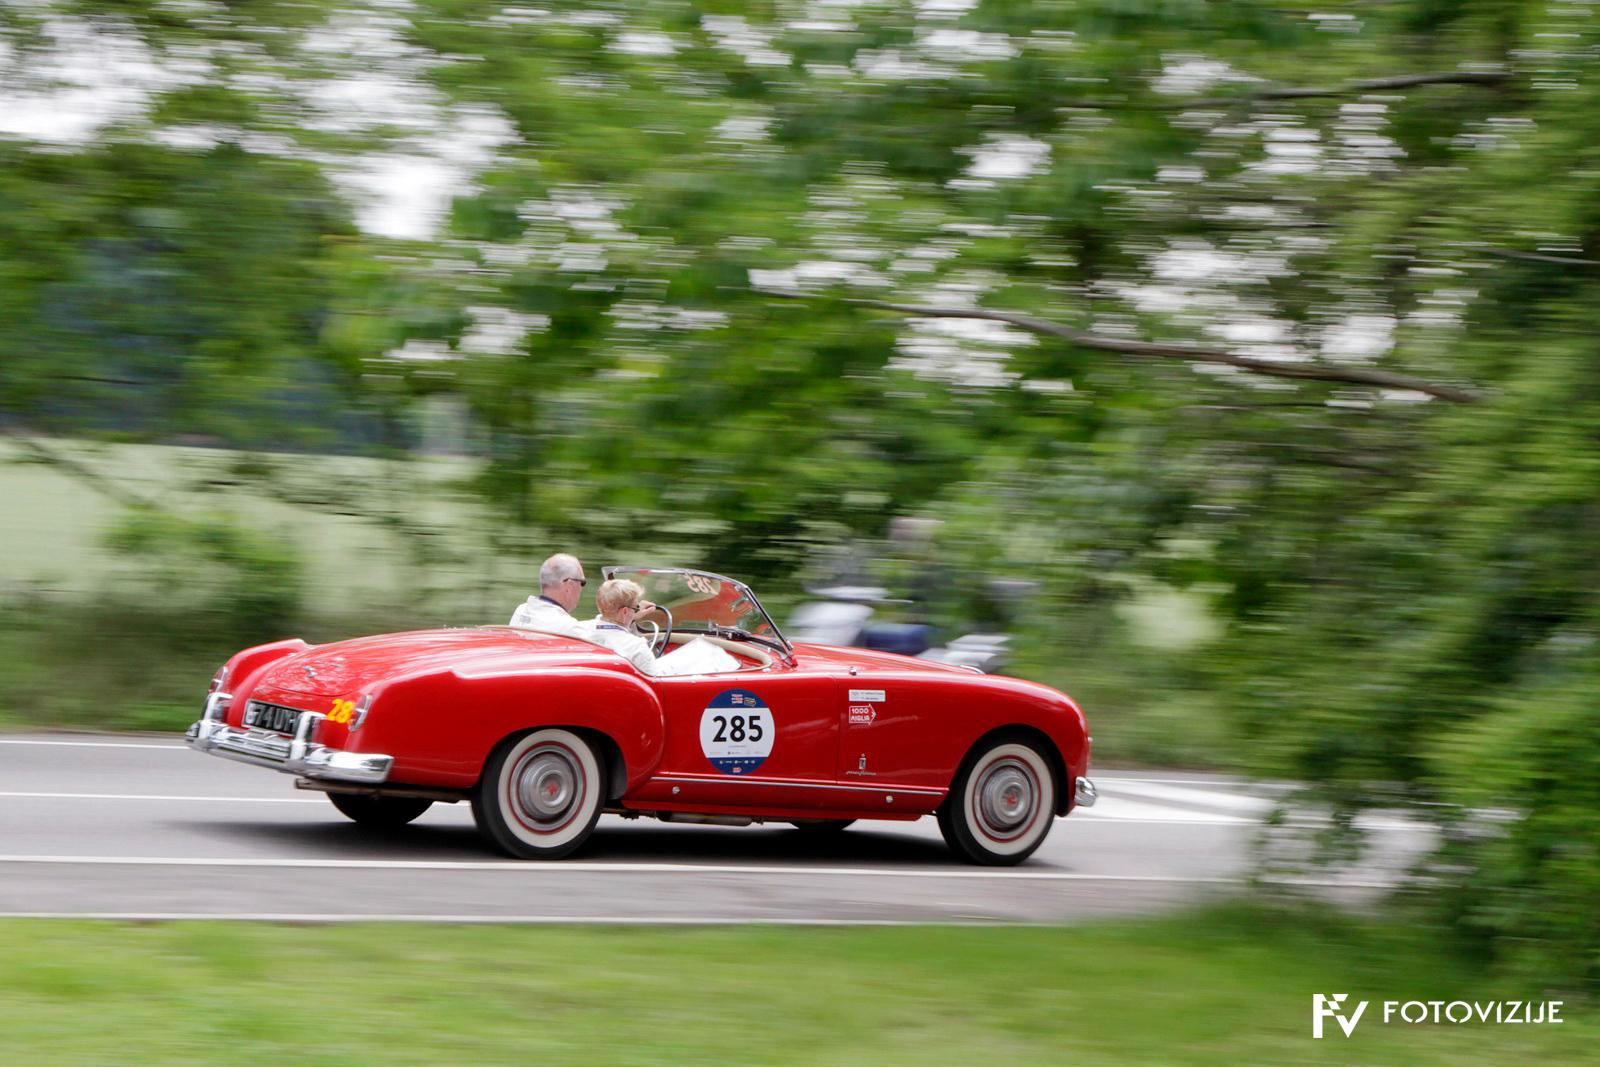 Mille Miglia 2018: Elegantni Nash Healey sports s 4,1-litrskim vrstnim šestvaljnikom